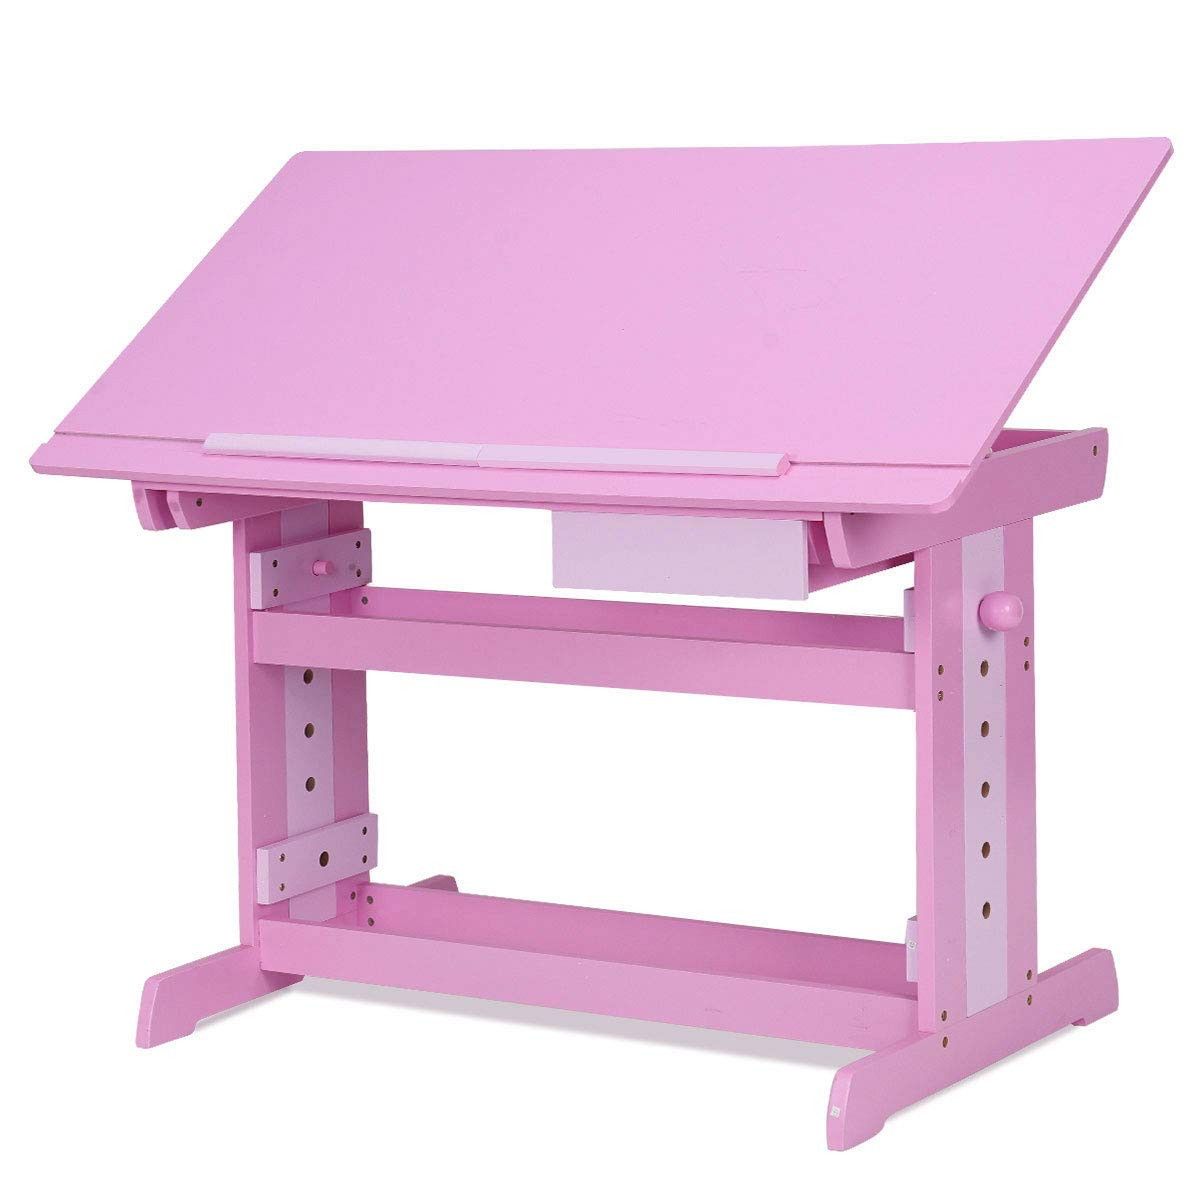 Costzon Adjustable Children Desk Drafting Table Art & Craft Drawing Desk w/Drawer Pink